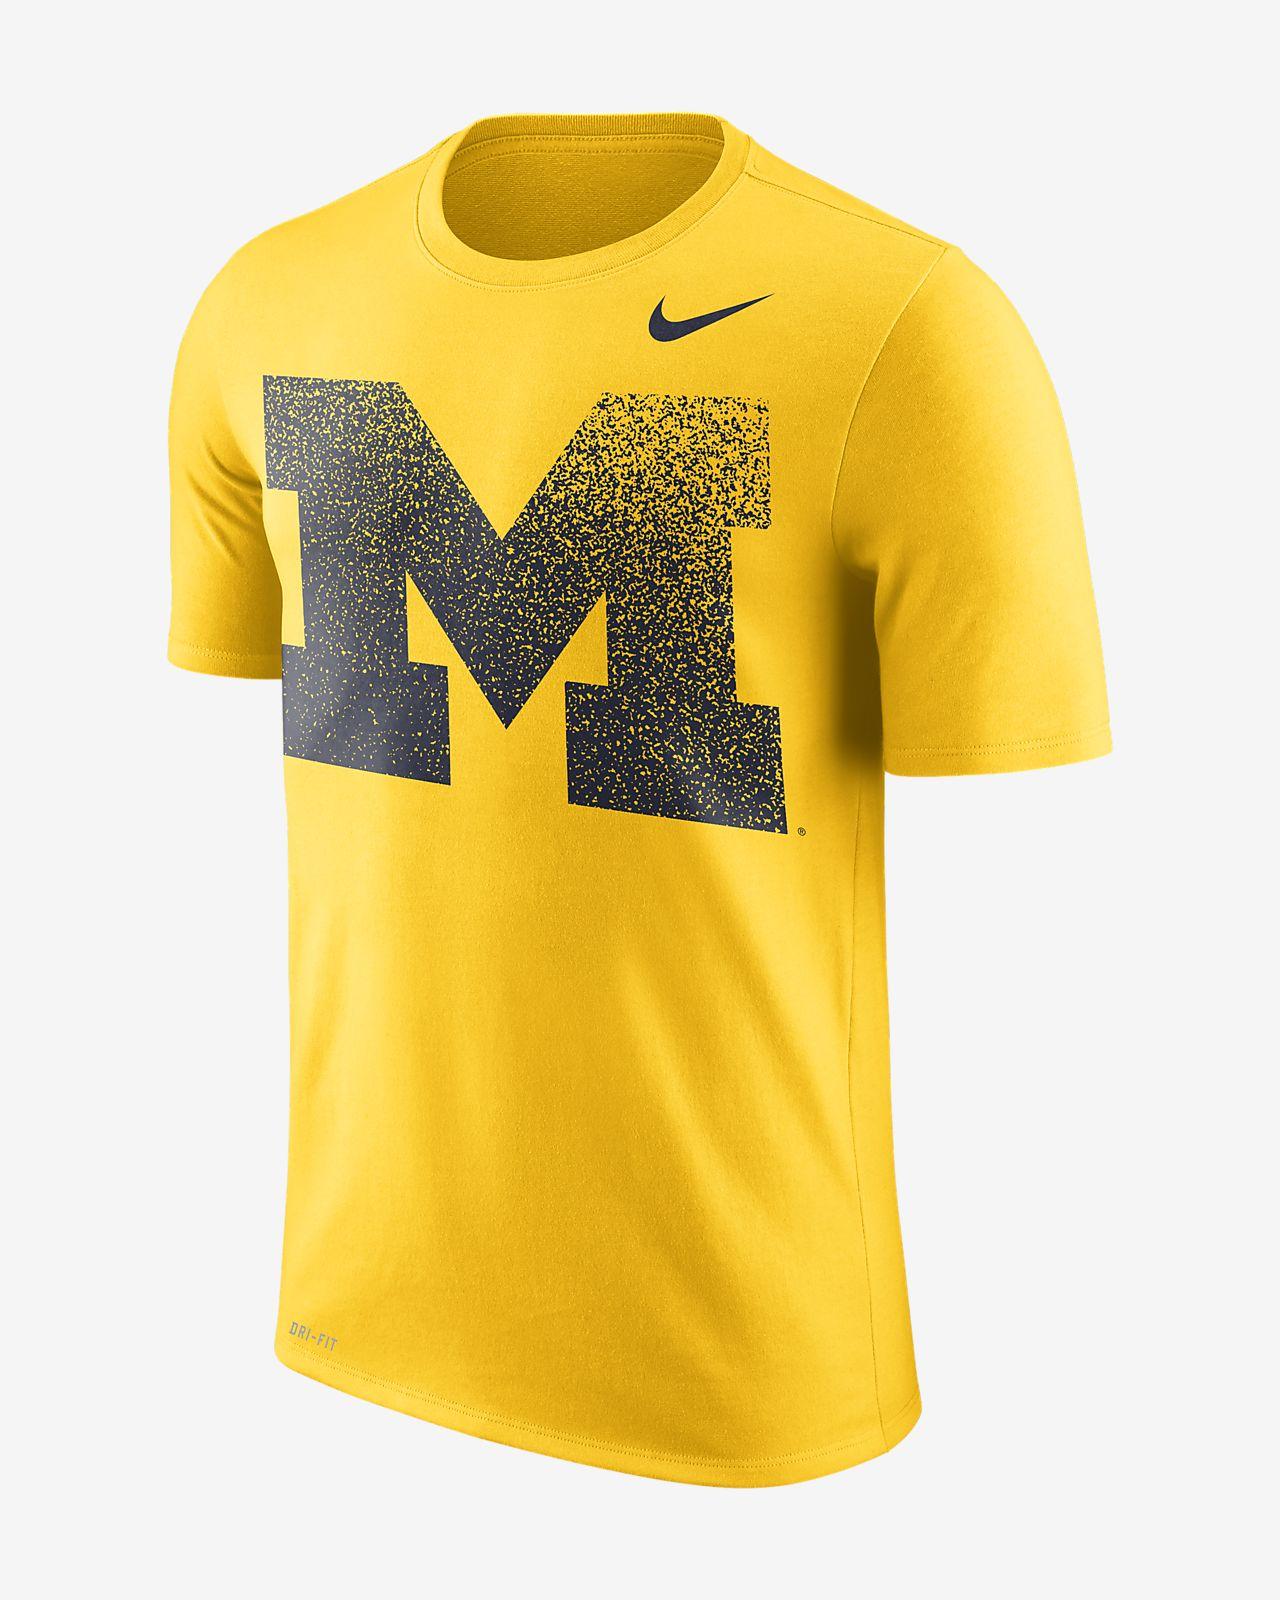 a05cfba8 Nike Dri-FIT Legend (Michigan) Men's Short-Sleeve T-Shirt. Nike.com